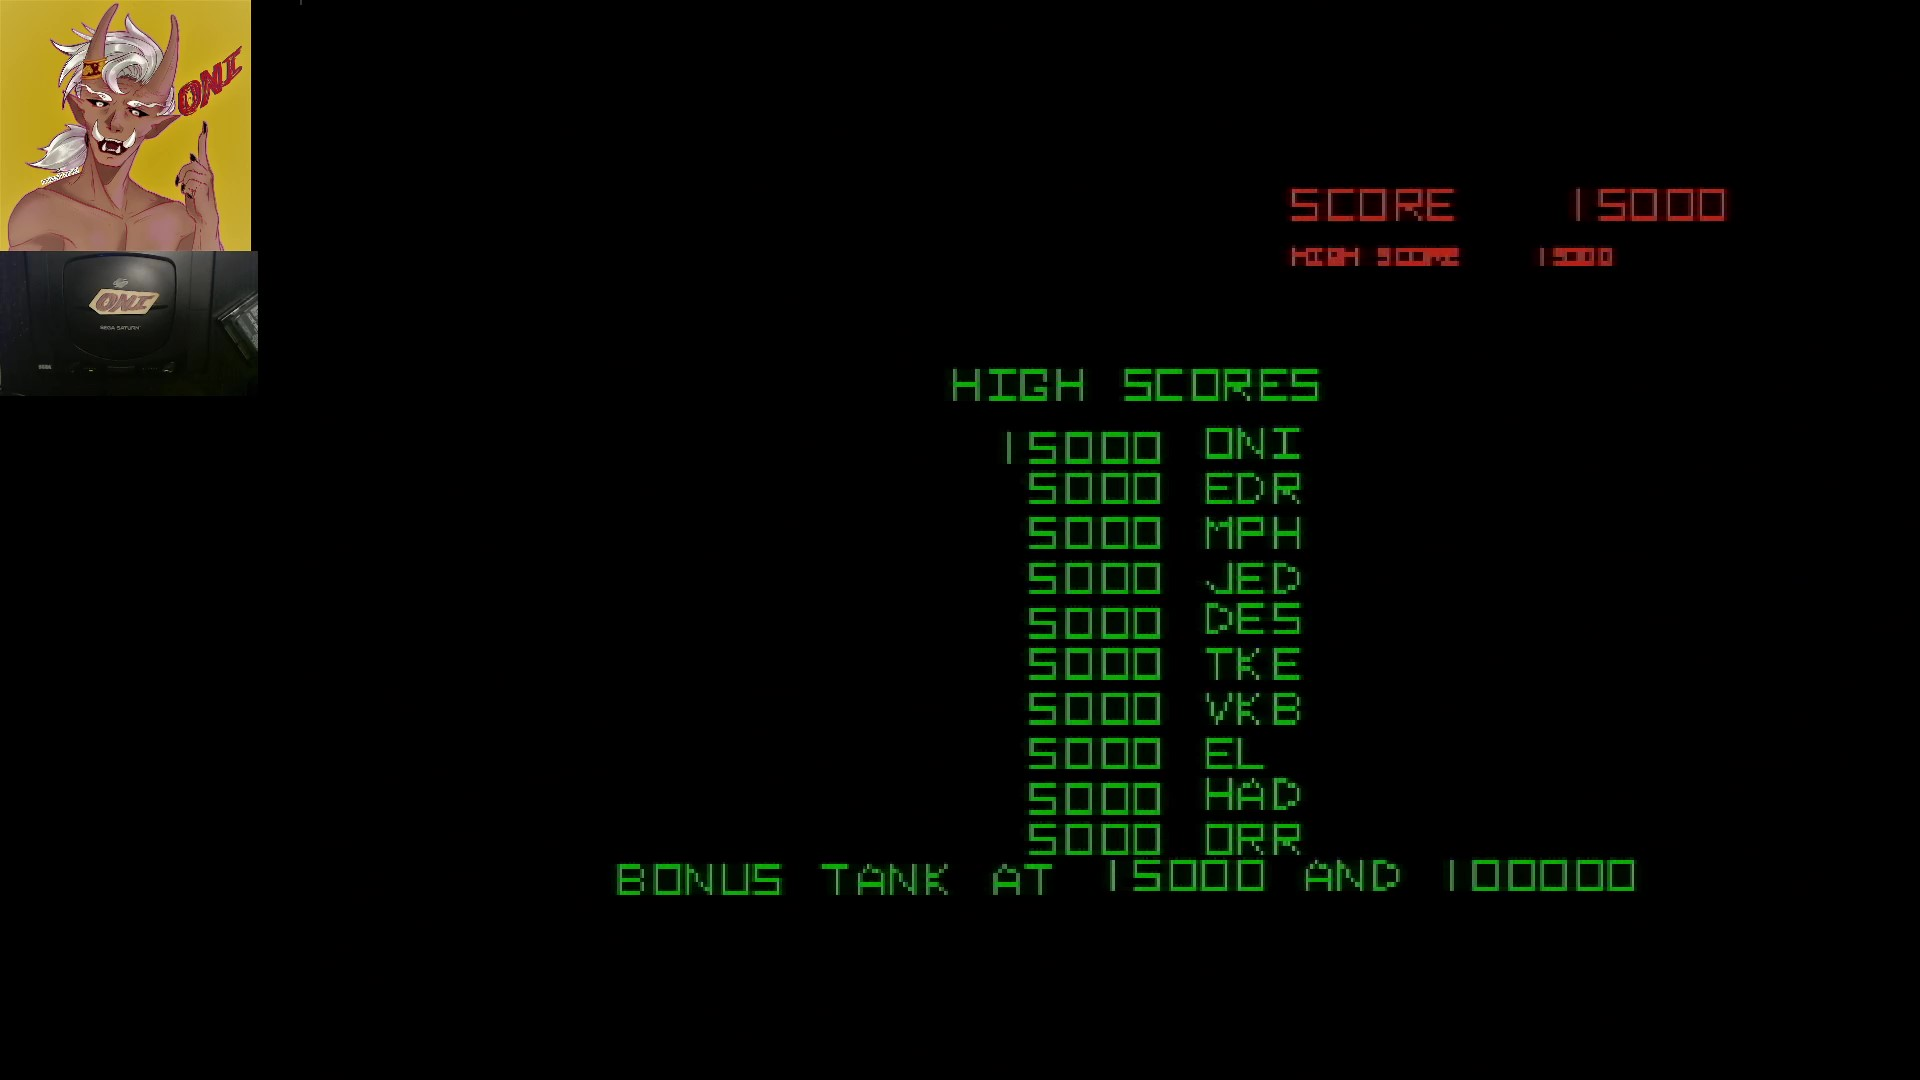 OniDensetsu: Arcade`s Greatest Hits: The Atari Collection 1: Battlezone (Sega Saturn) 15,000 points on 2021-07-17 03:21:28